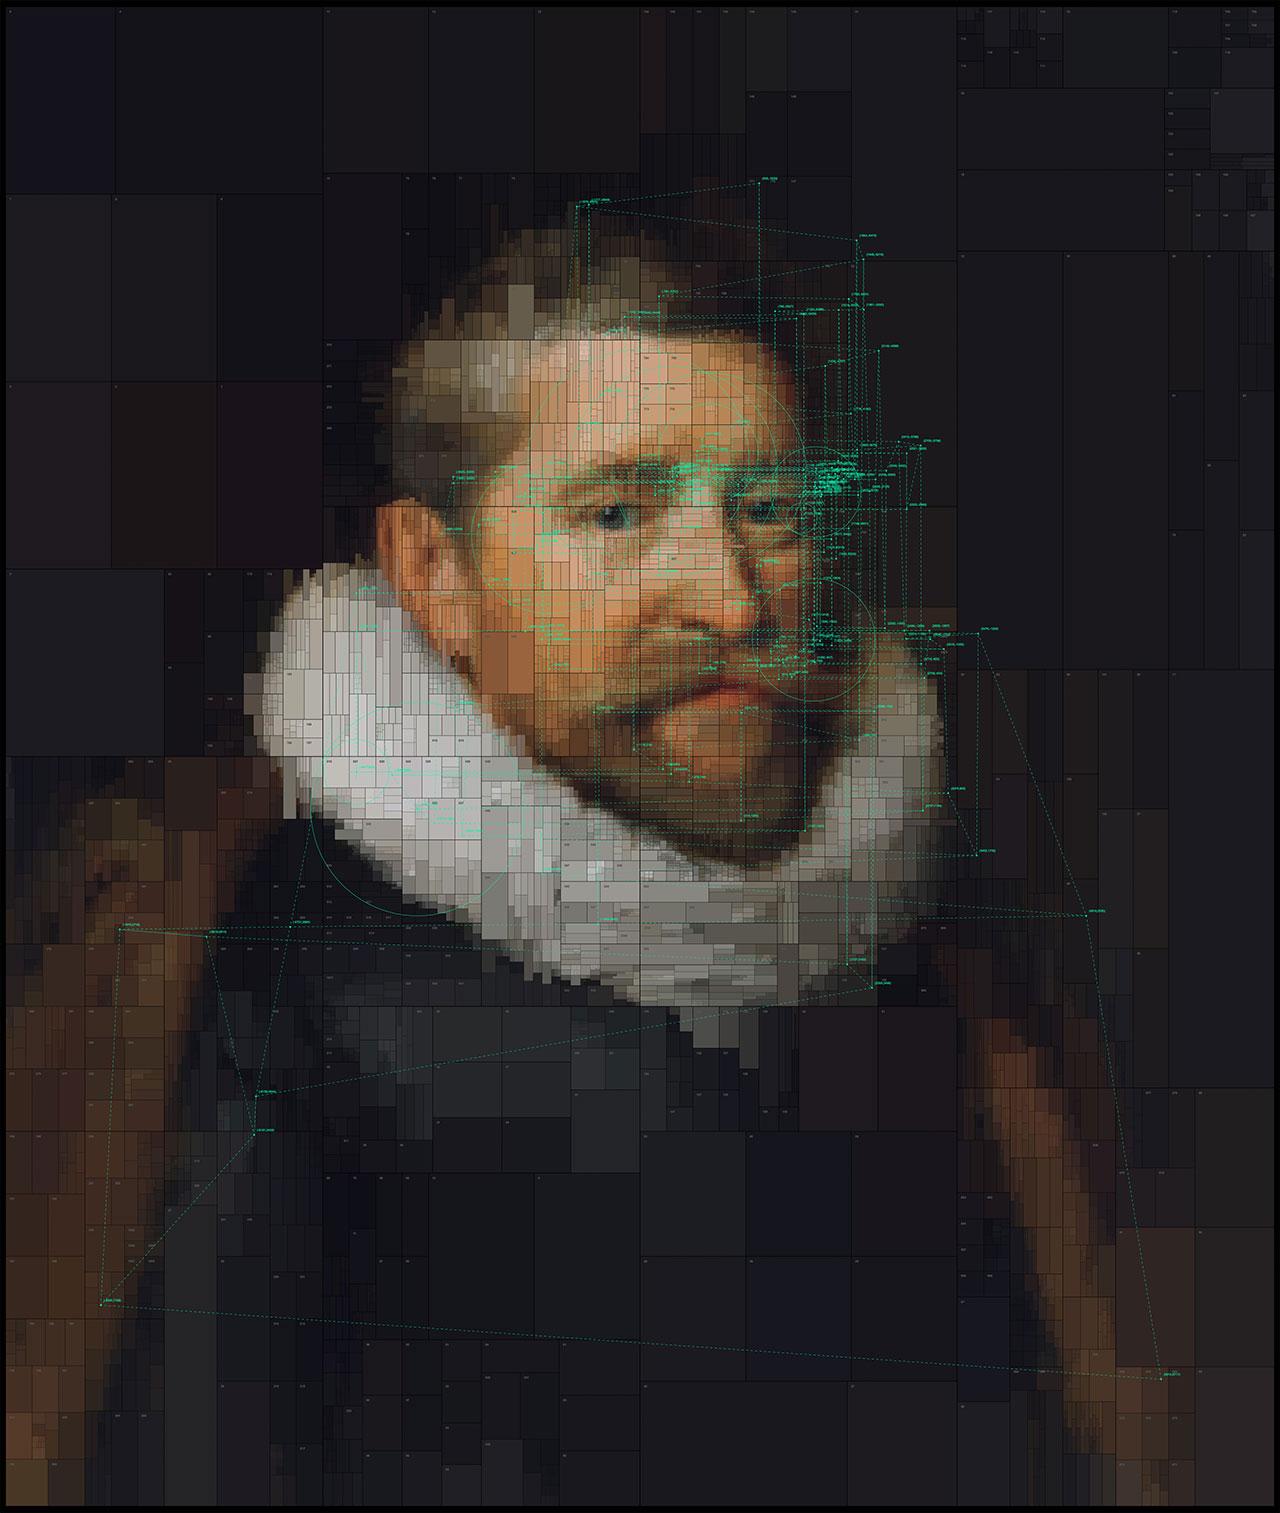 Sir Henry Wotton, from Portraits series by Dimitris Ladopoulos (Original paintingbyMichiel Janszoon van Mierevelt, 1620).